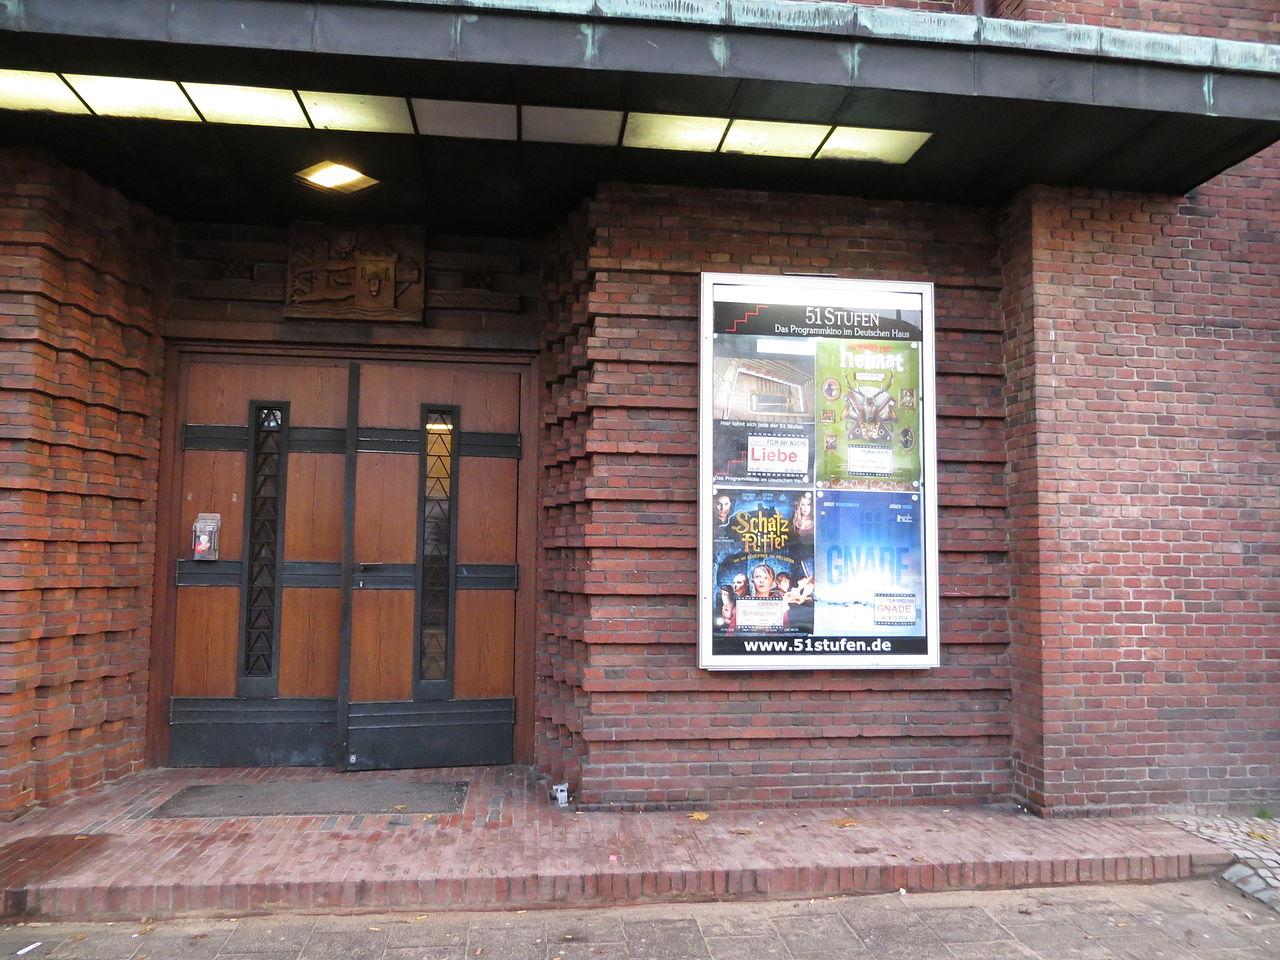 51 Stufen Kino Flensburg